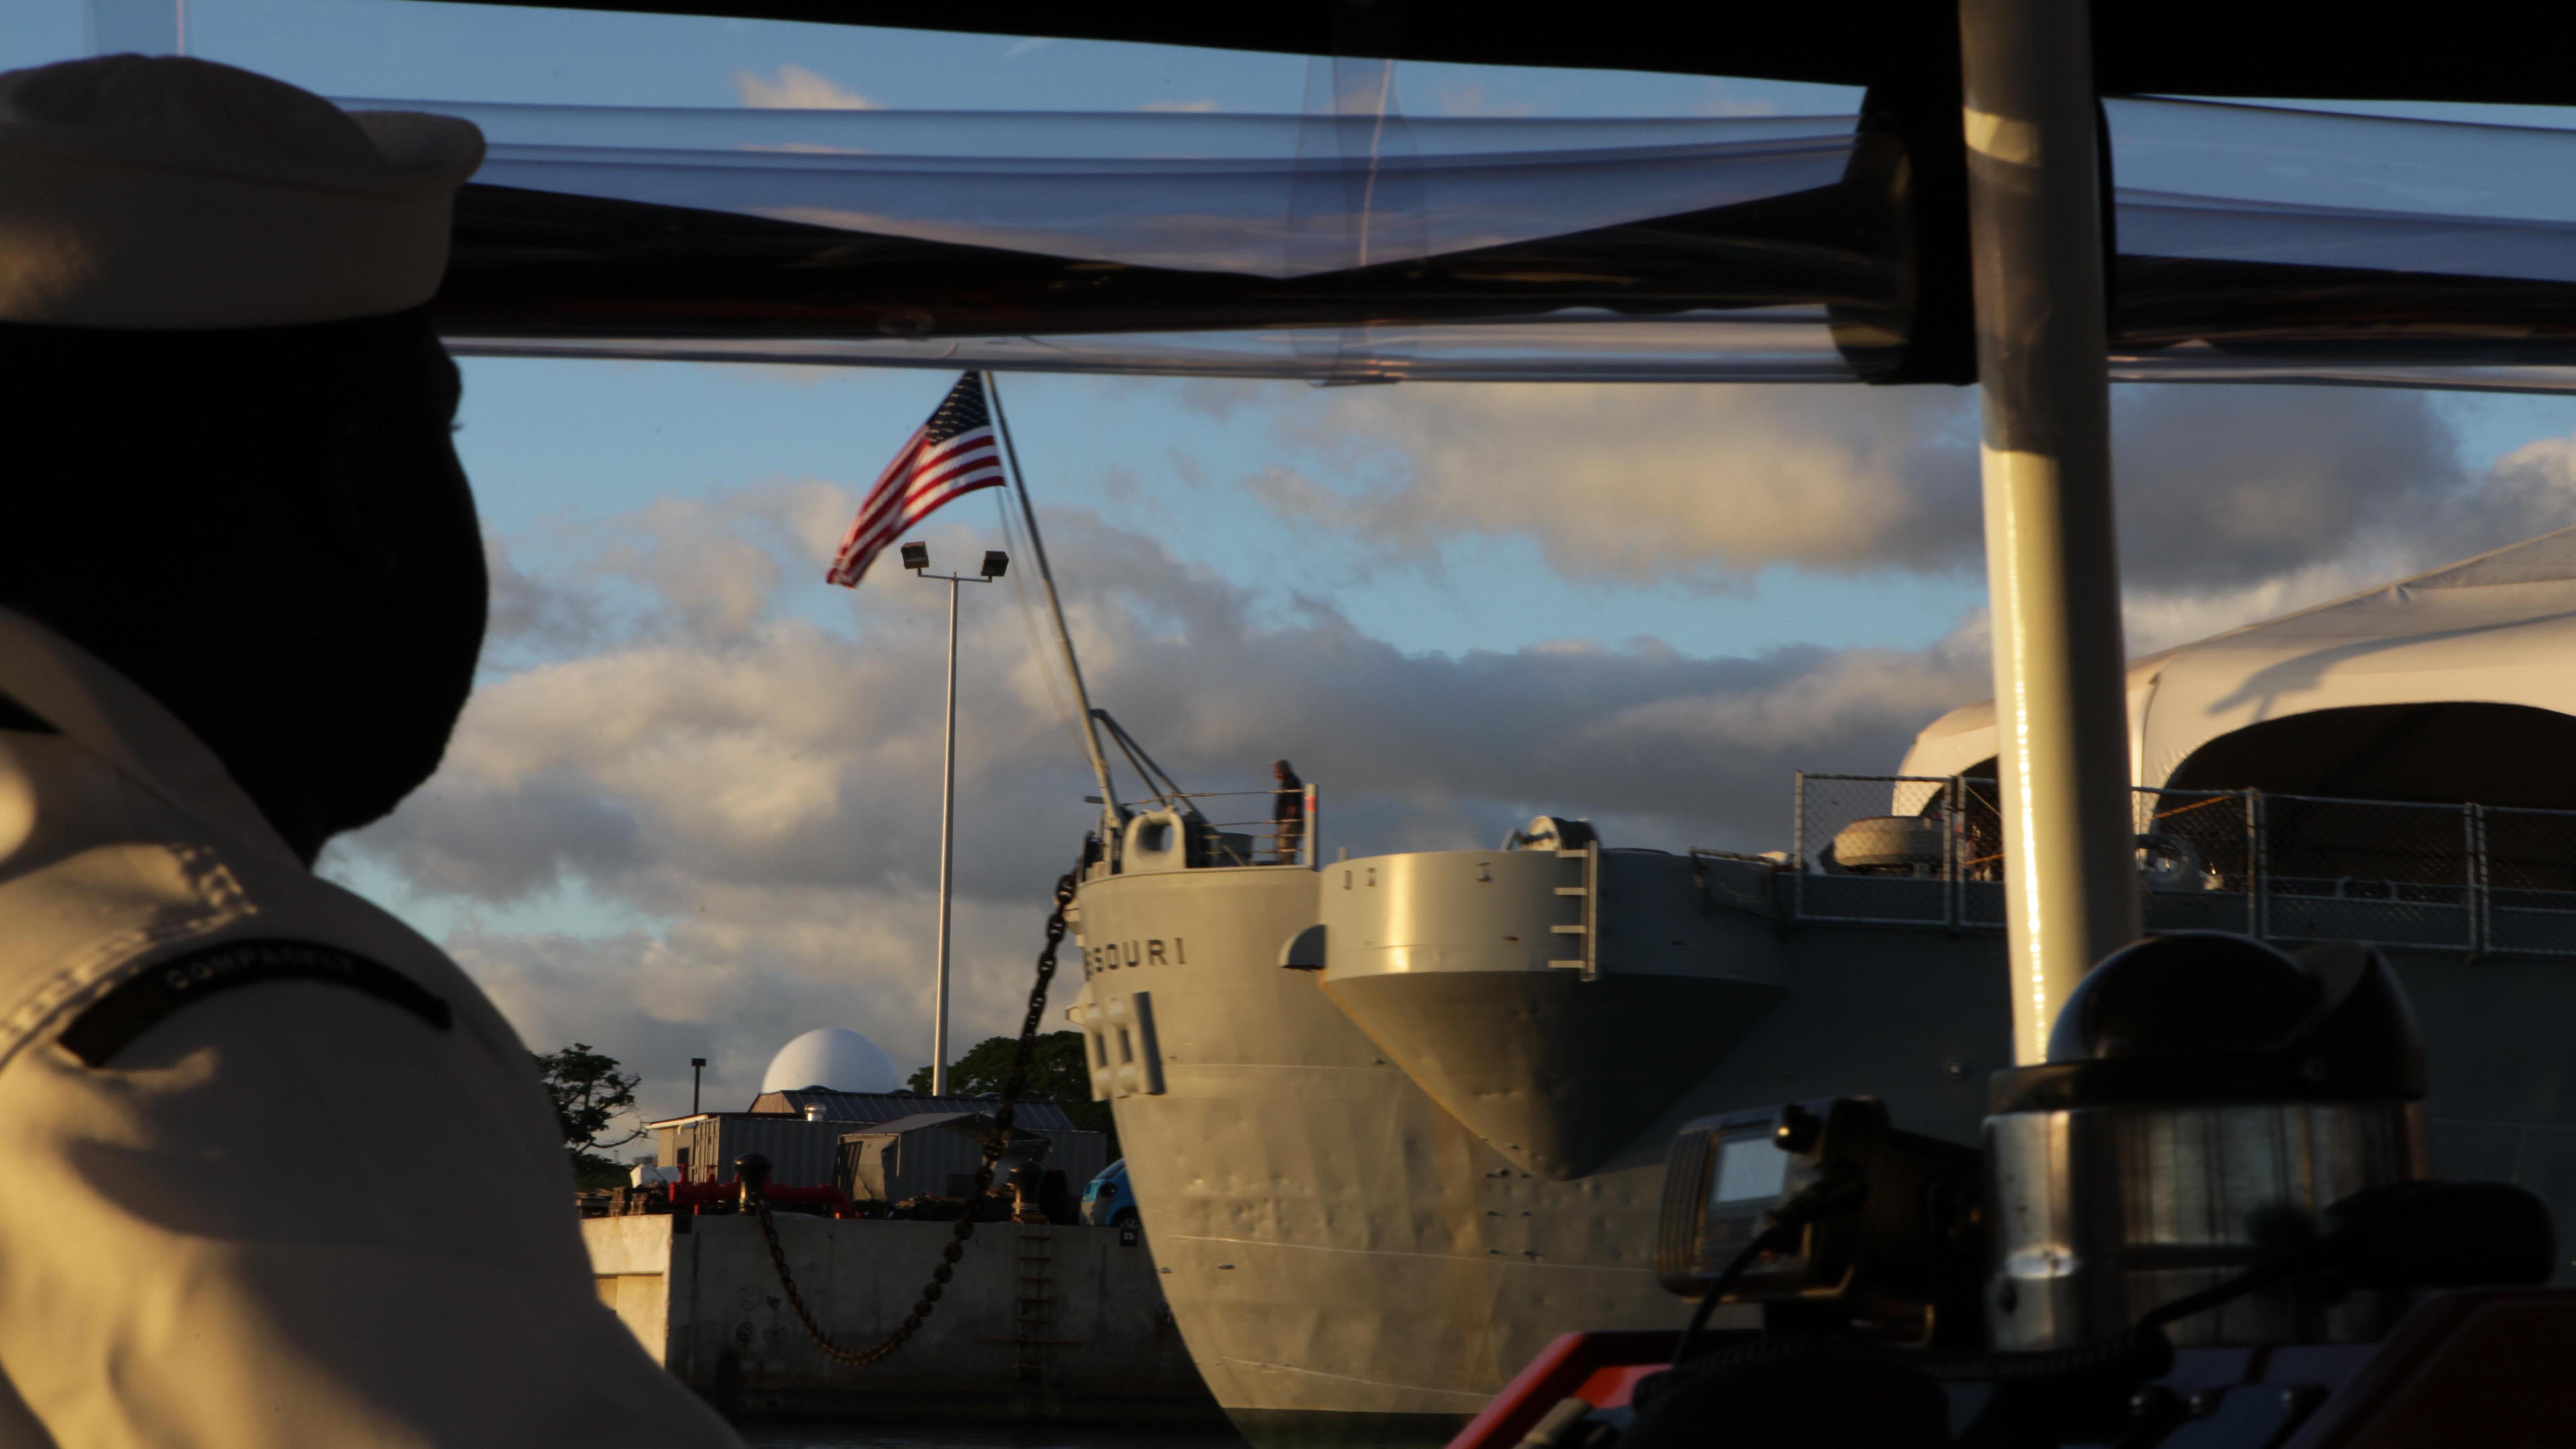 marine corps mcc codes - photo #22